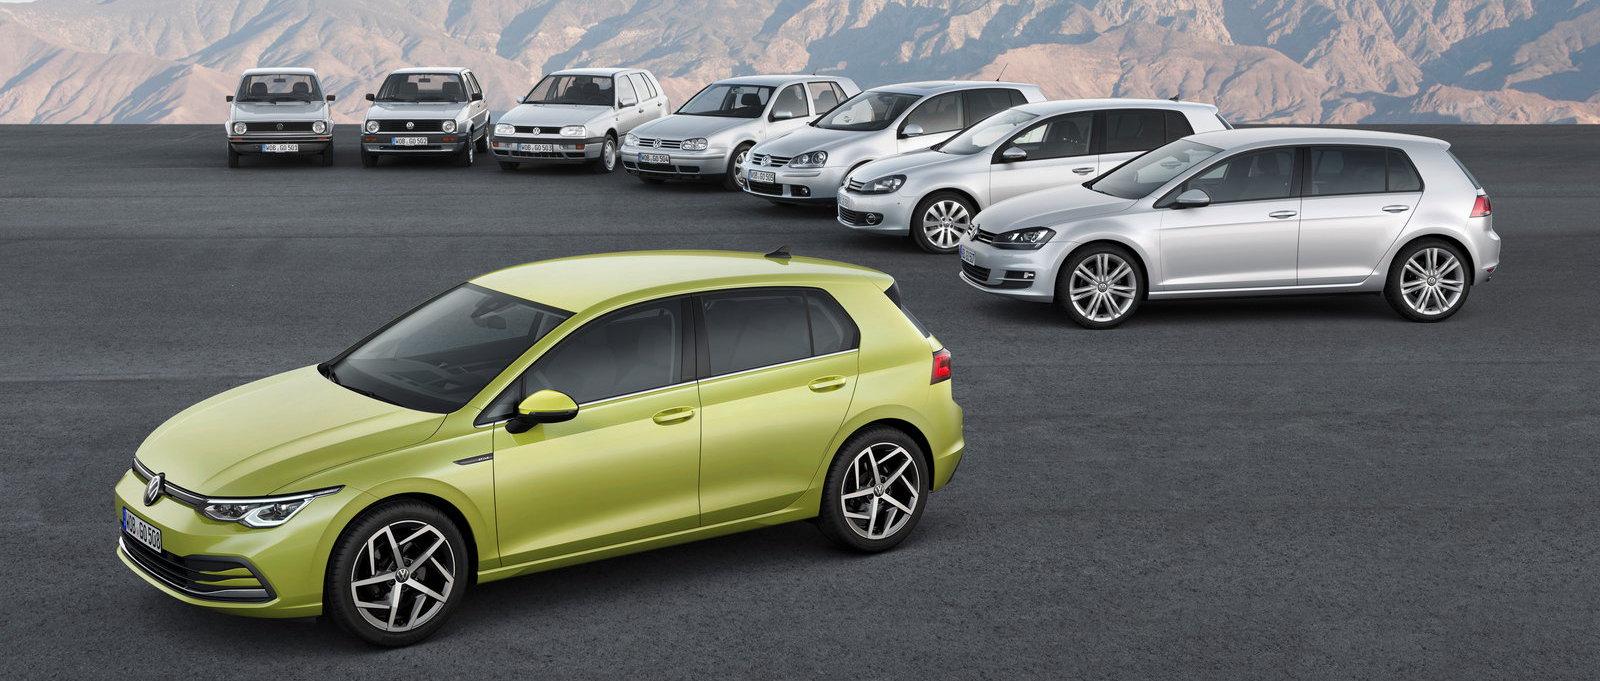 VW GOLF 2020 48